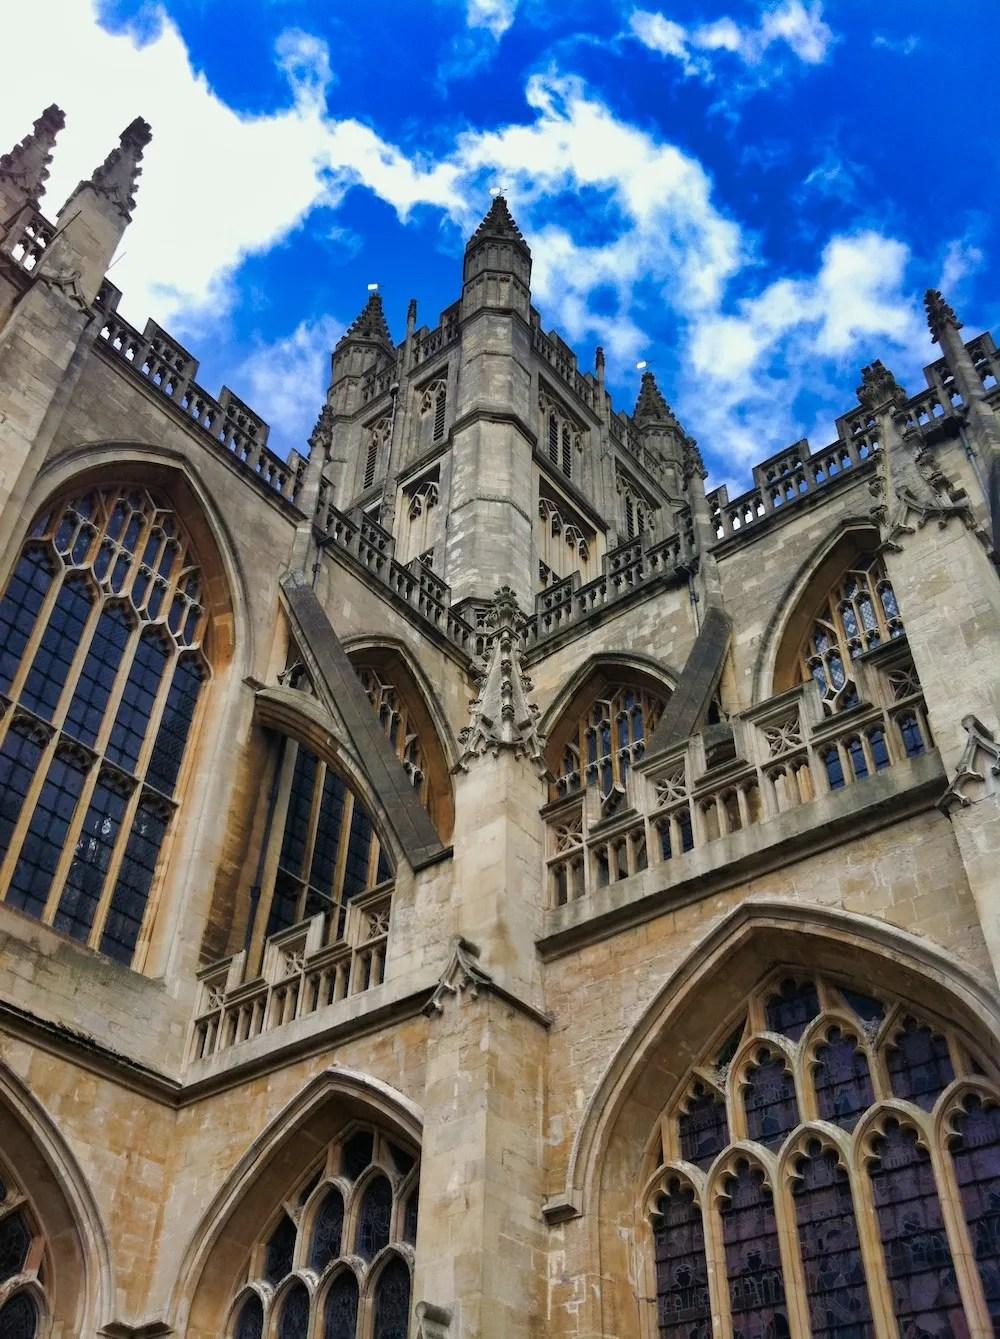 Bath Day Trip - Exterior of the Bath Abbey